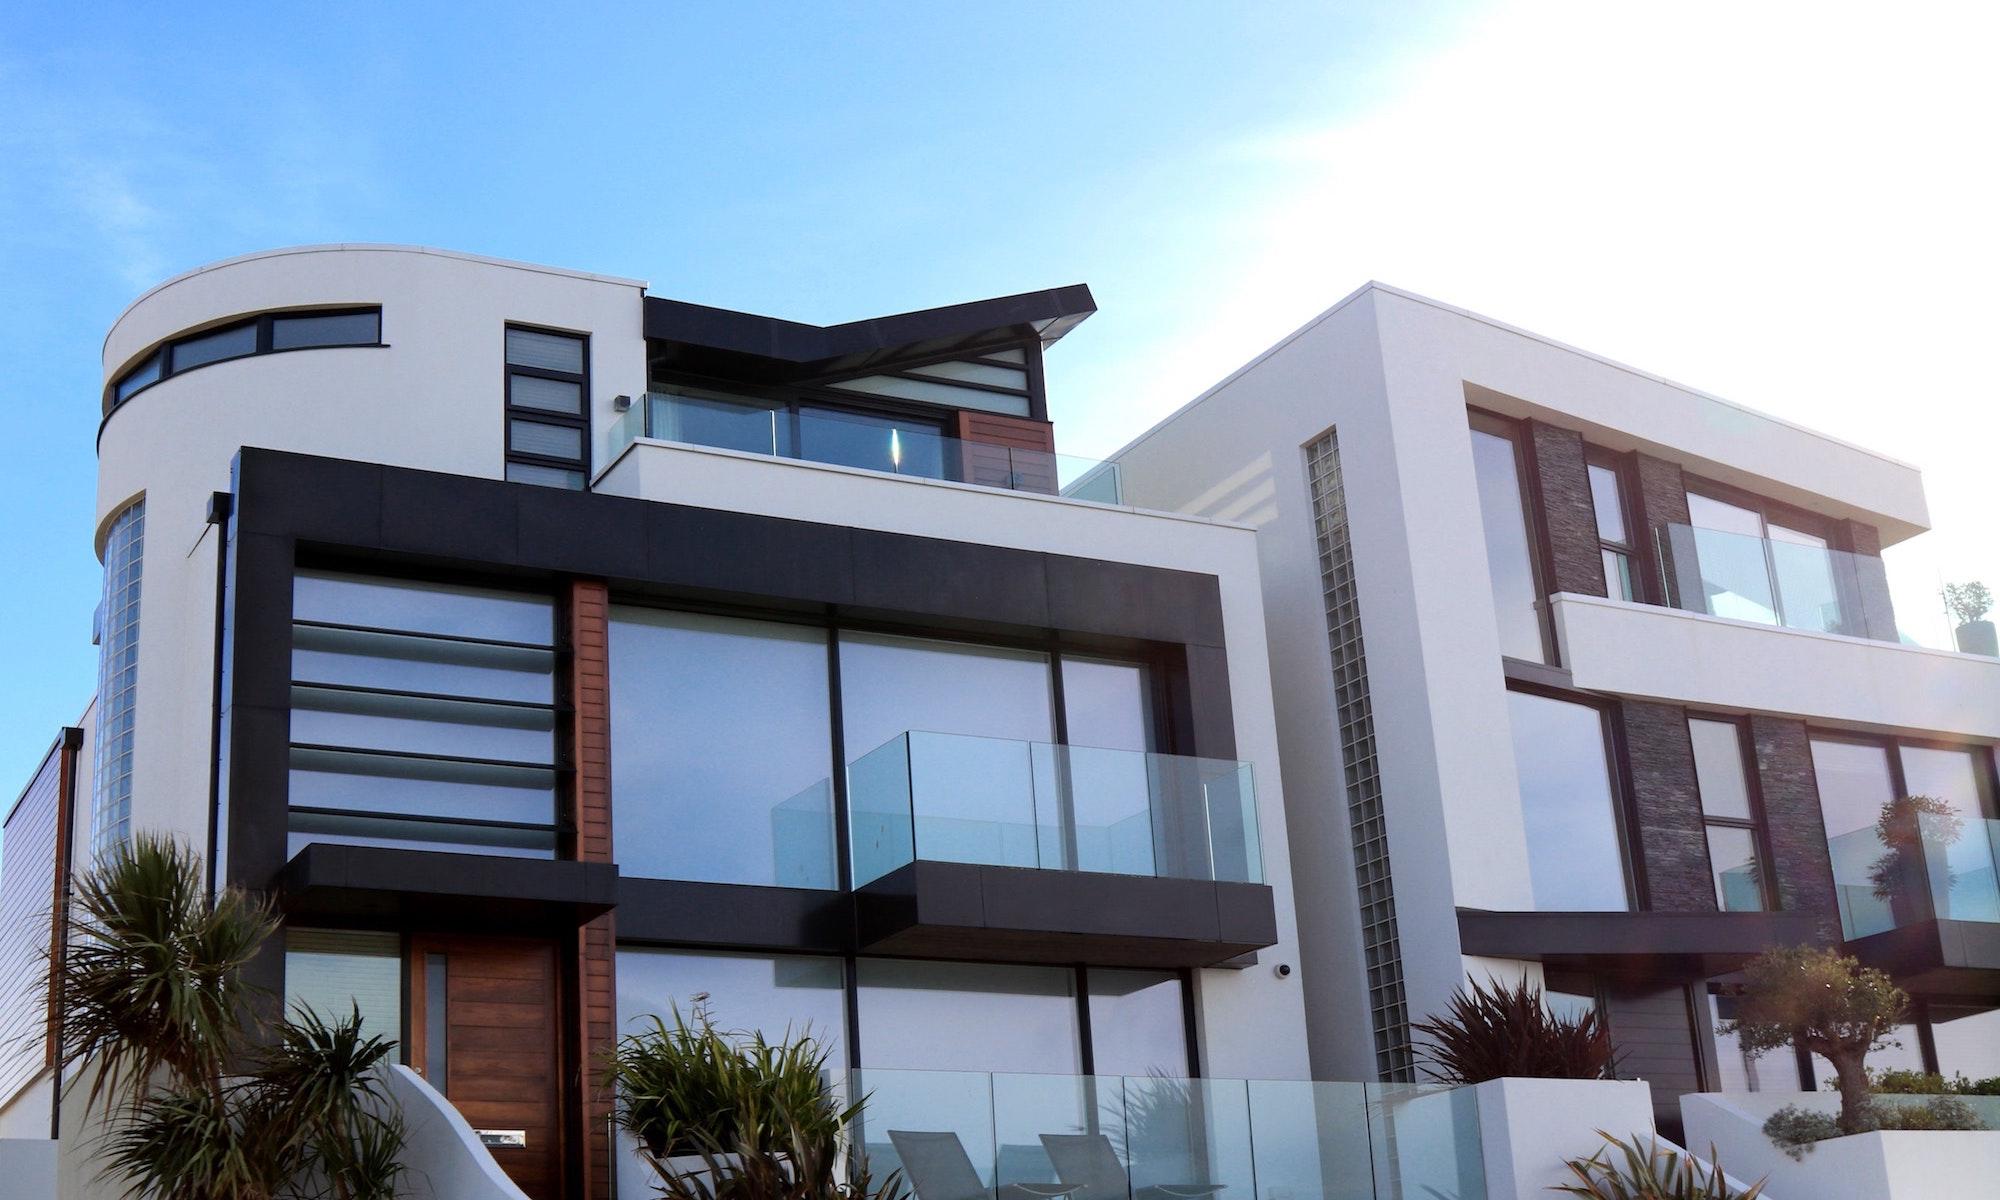 apartment-architectural-design-architecture-323780